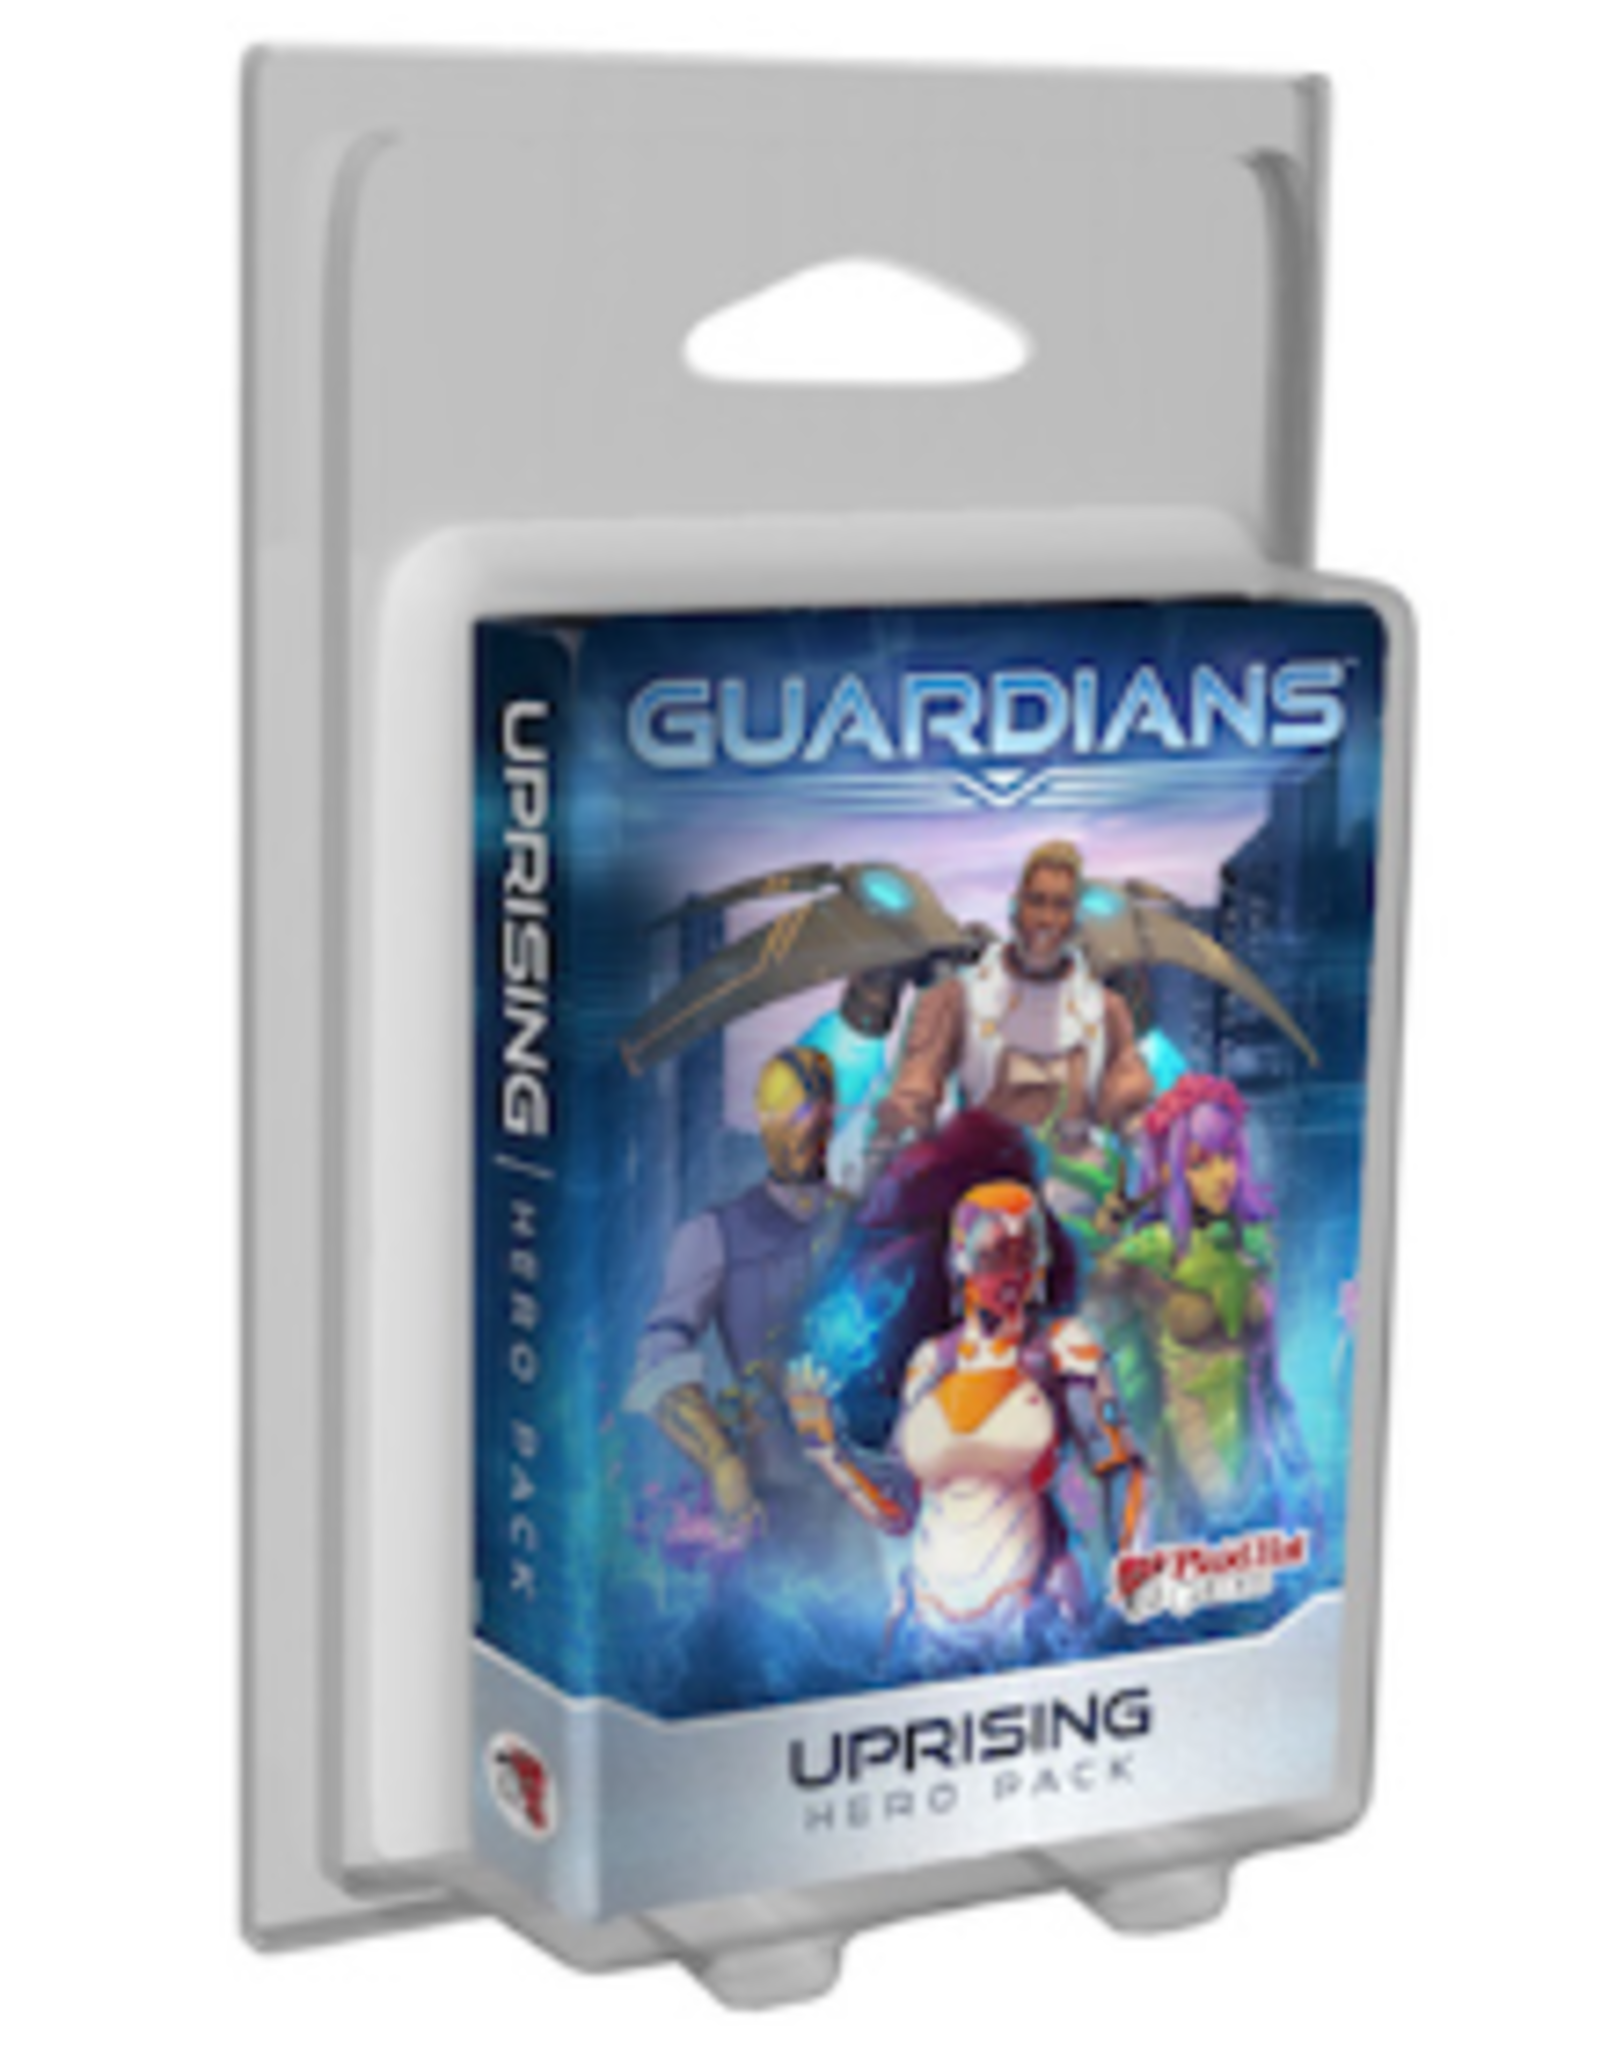 Plaid Hat Games Guardians: Hero Pack - Uprising Expansion